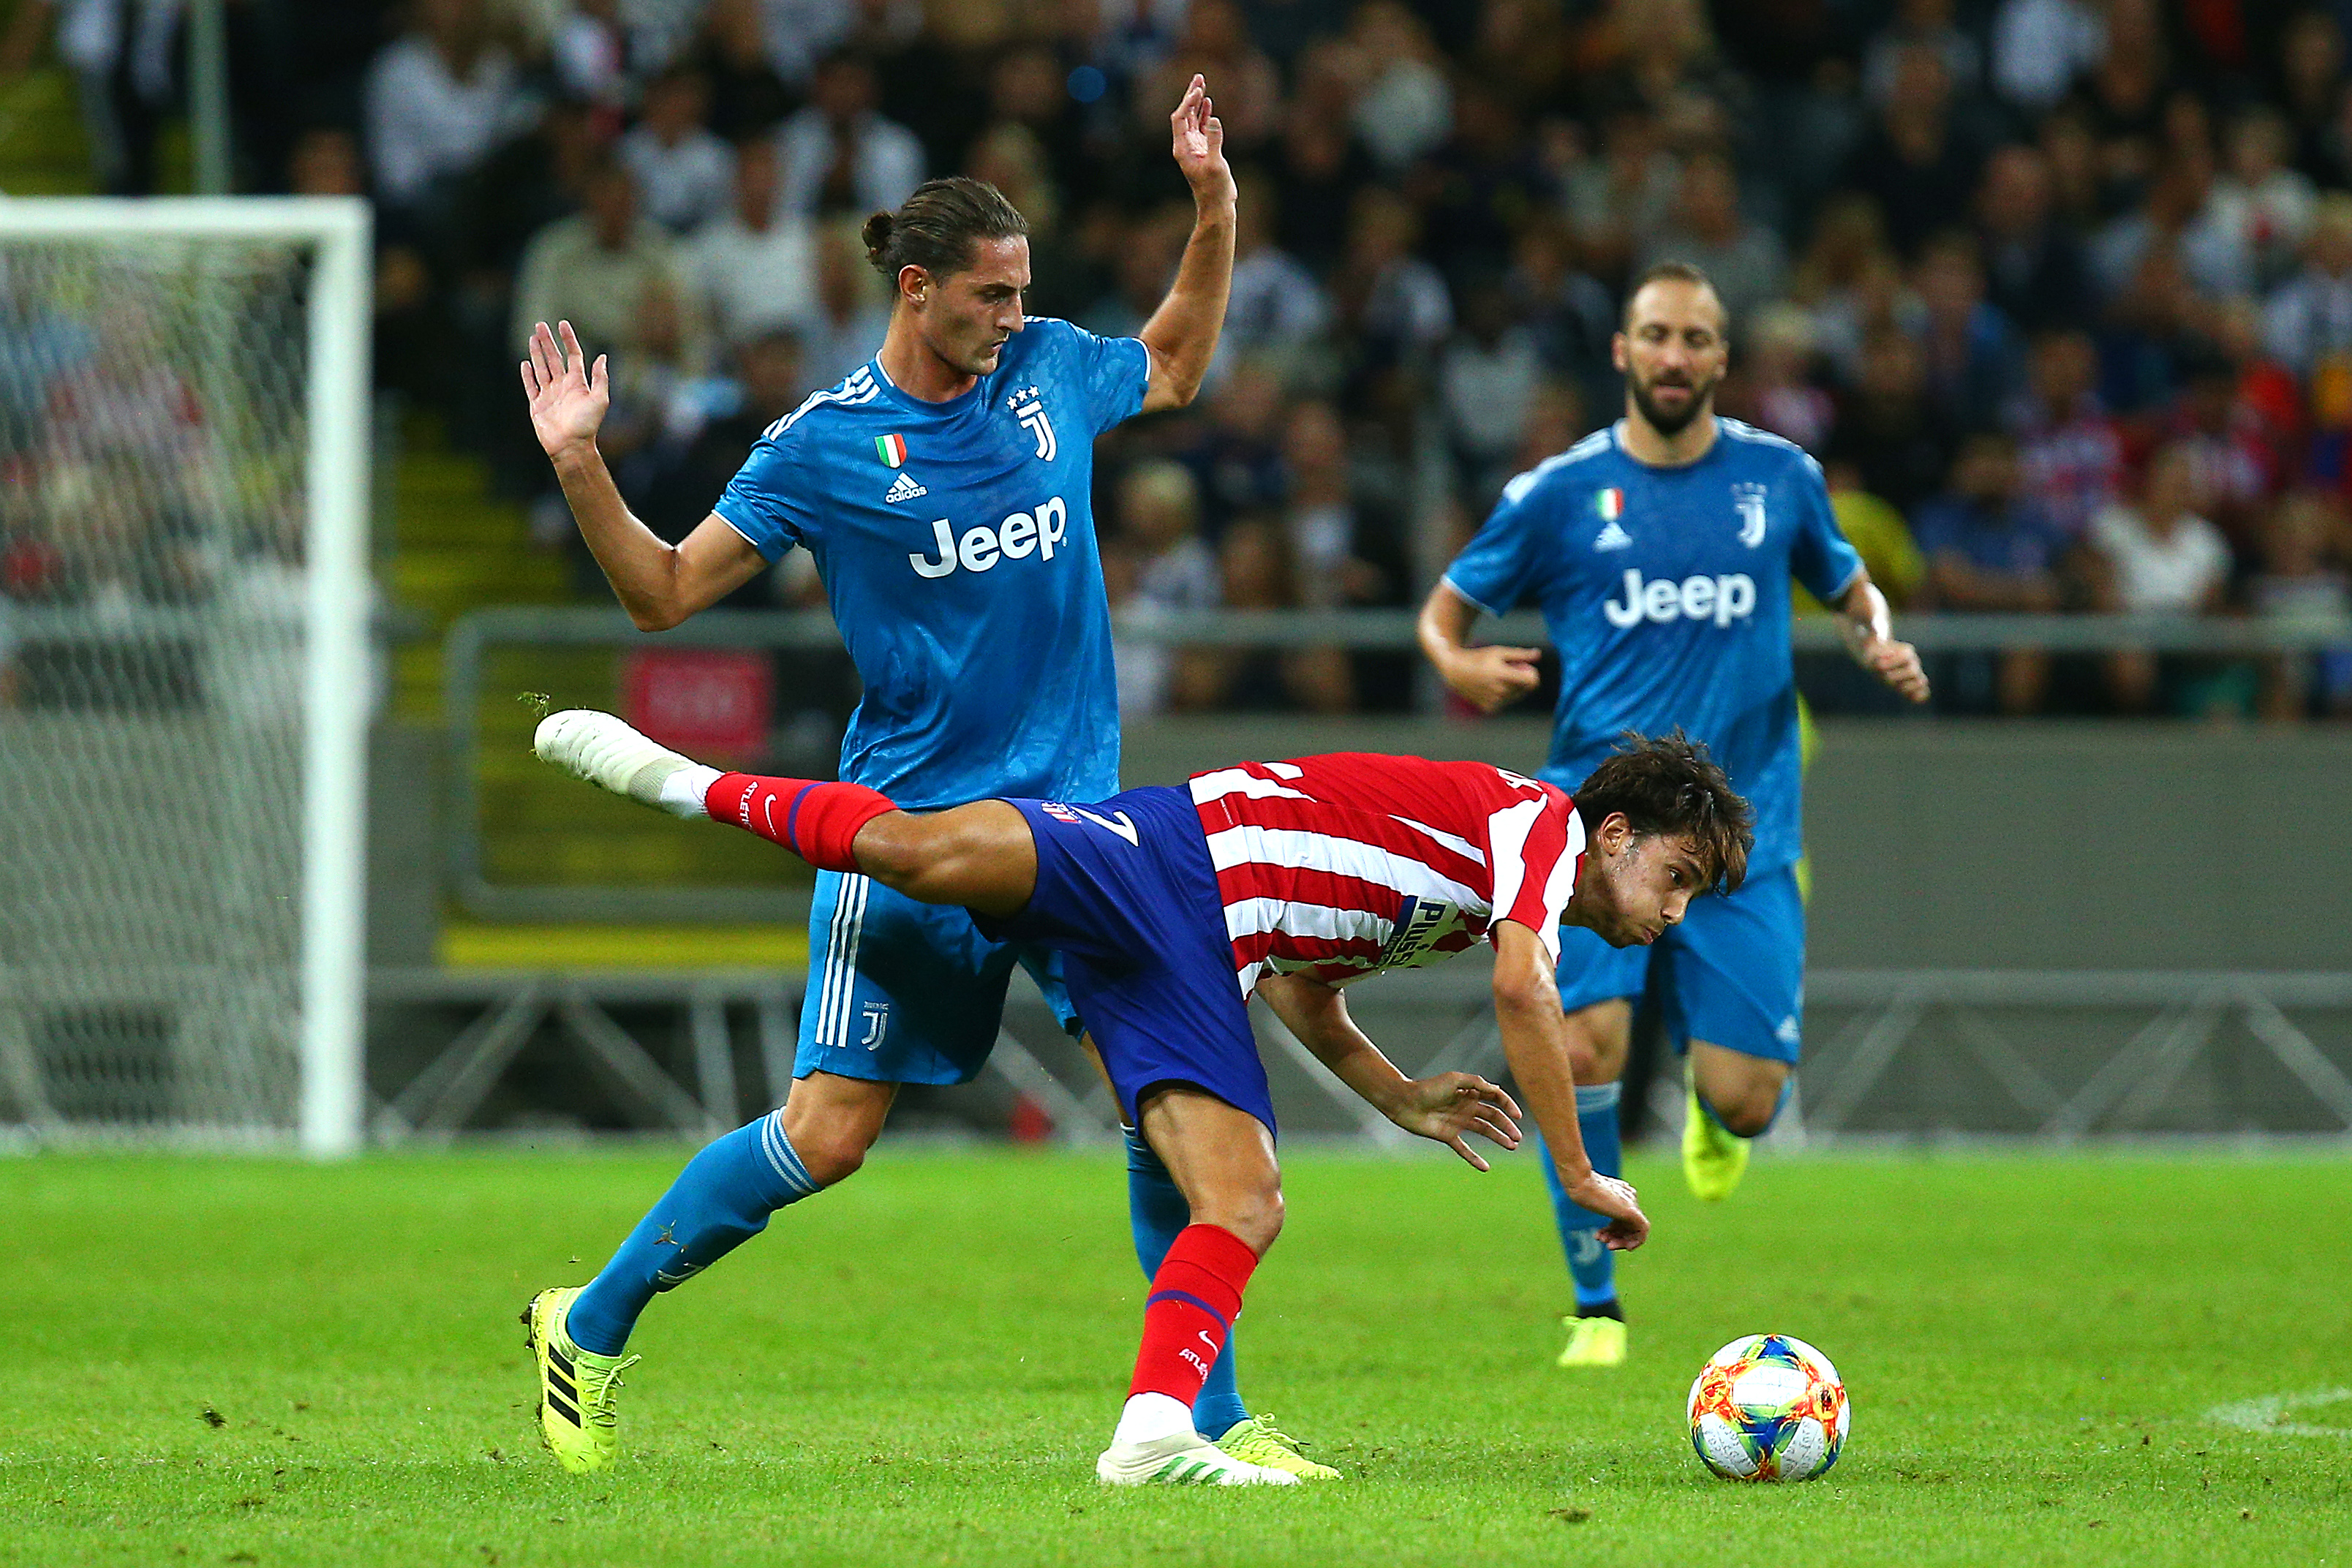 Atletico Madrid v Juventus - International Champions Cup